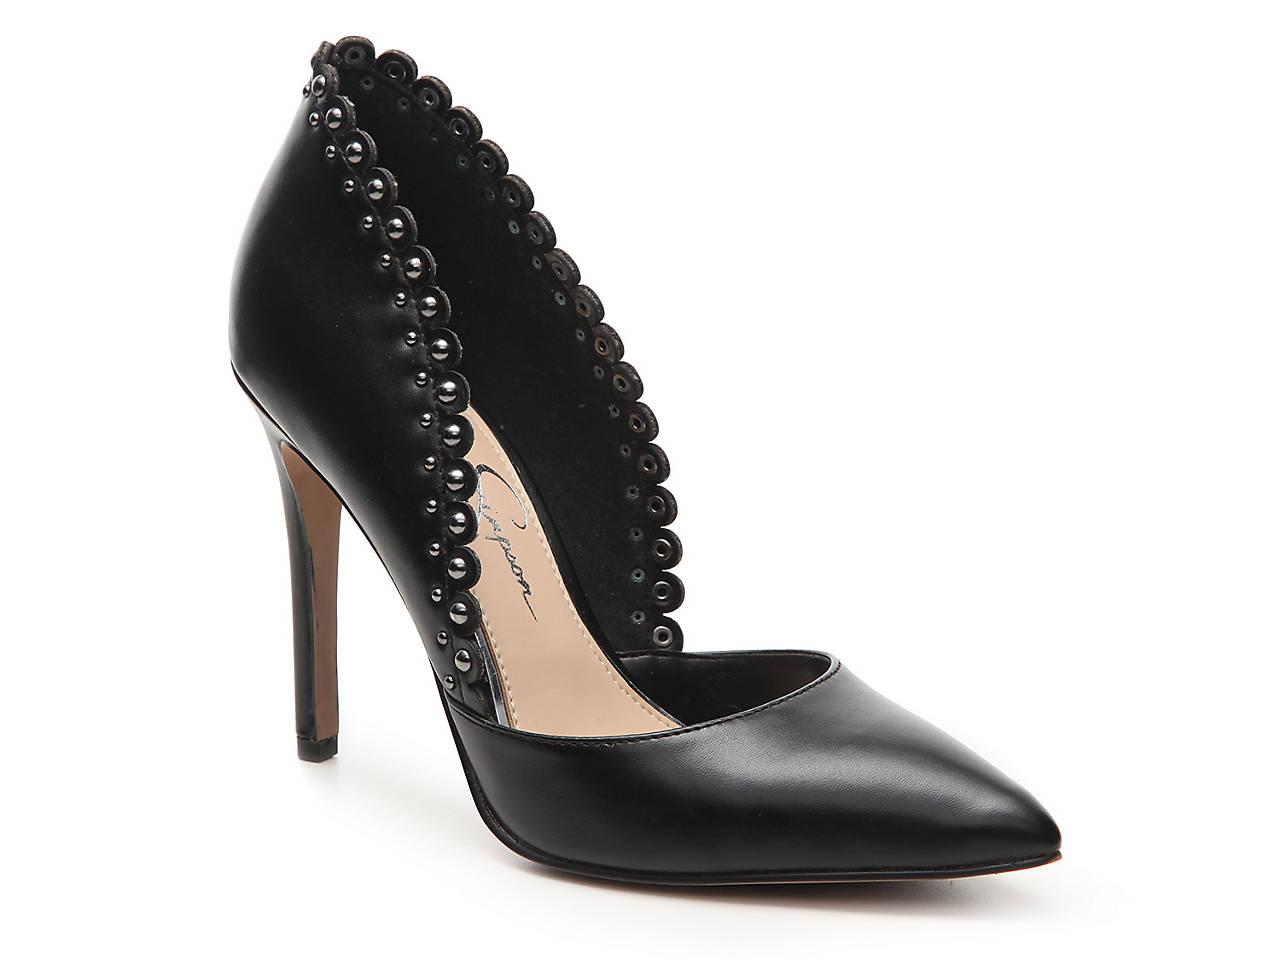 b480671e4f0b Jessica Simpson Paulene Pump Women s Shoes